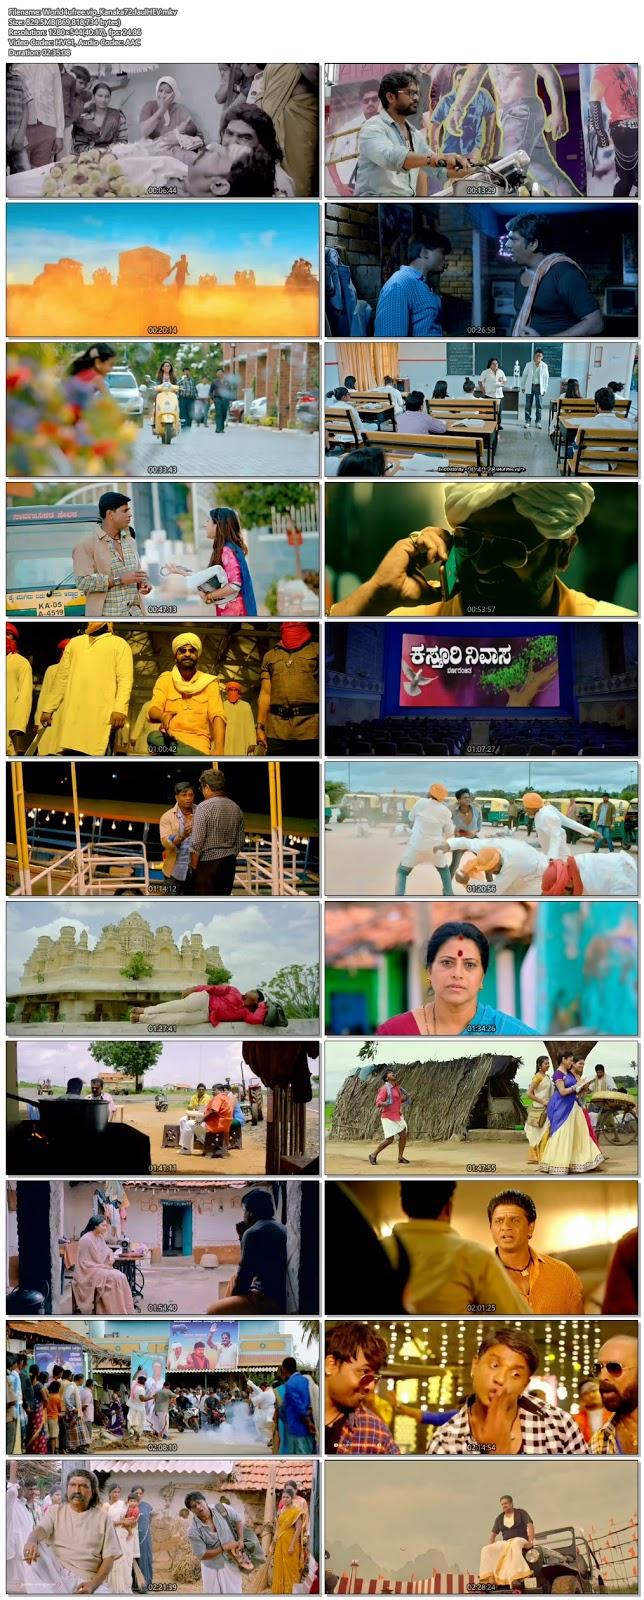 Kanaka 2018 Dual Audio 720p UNCUT HDRip 800Mb x265 HEVC world4ufree.vip , South indian movie Kanaka 2018 hindi dubbed world4ufree.vip 720p hdrip webrip dvdrip 700mb brrip bluray free download or watch online at world4ufree.vip